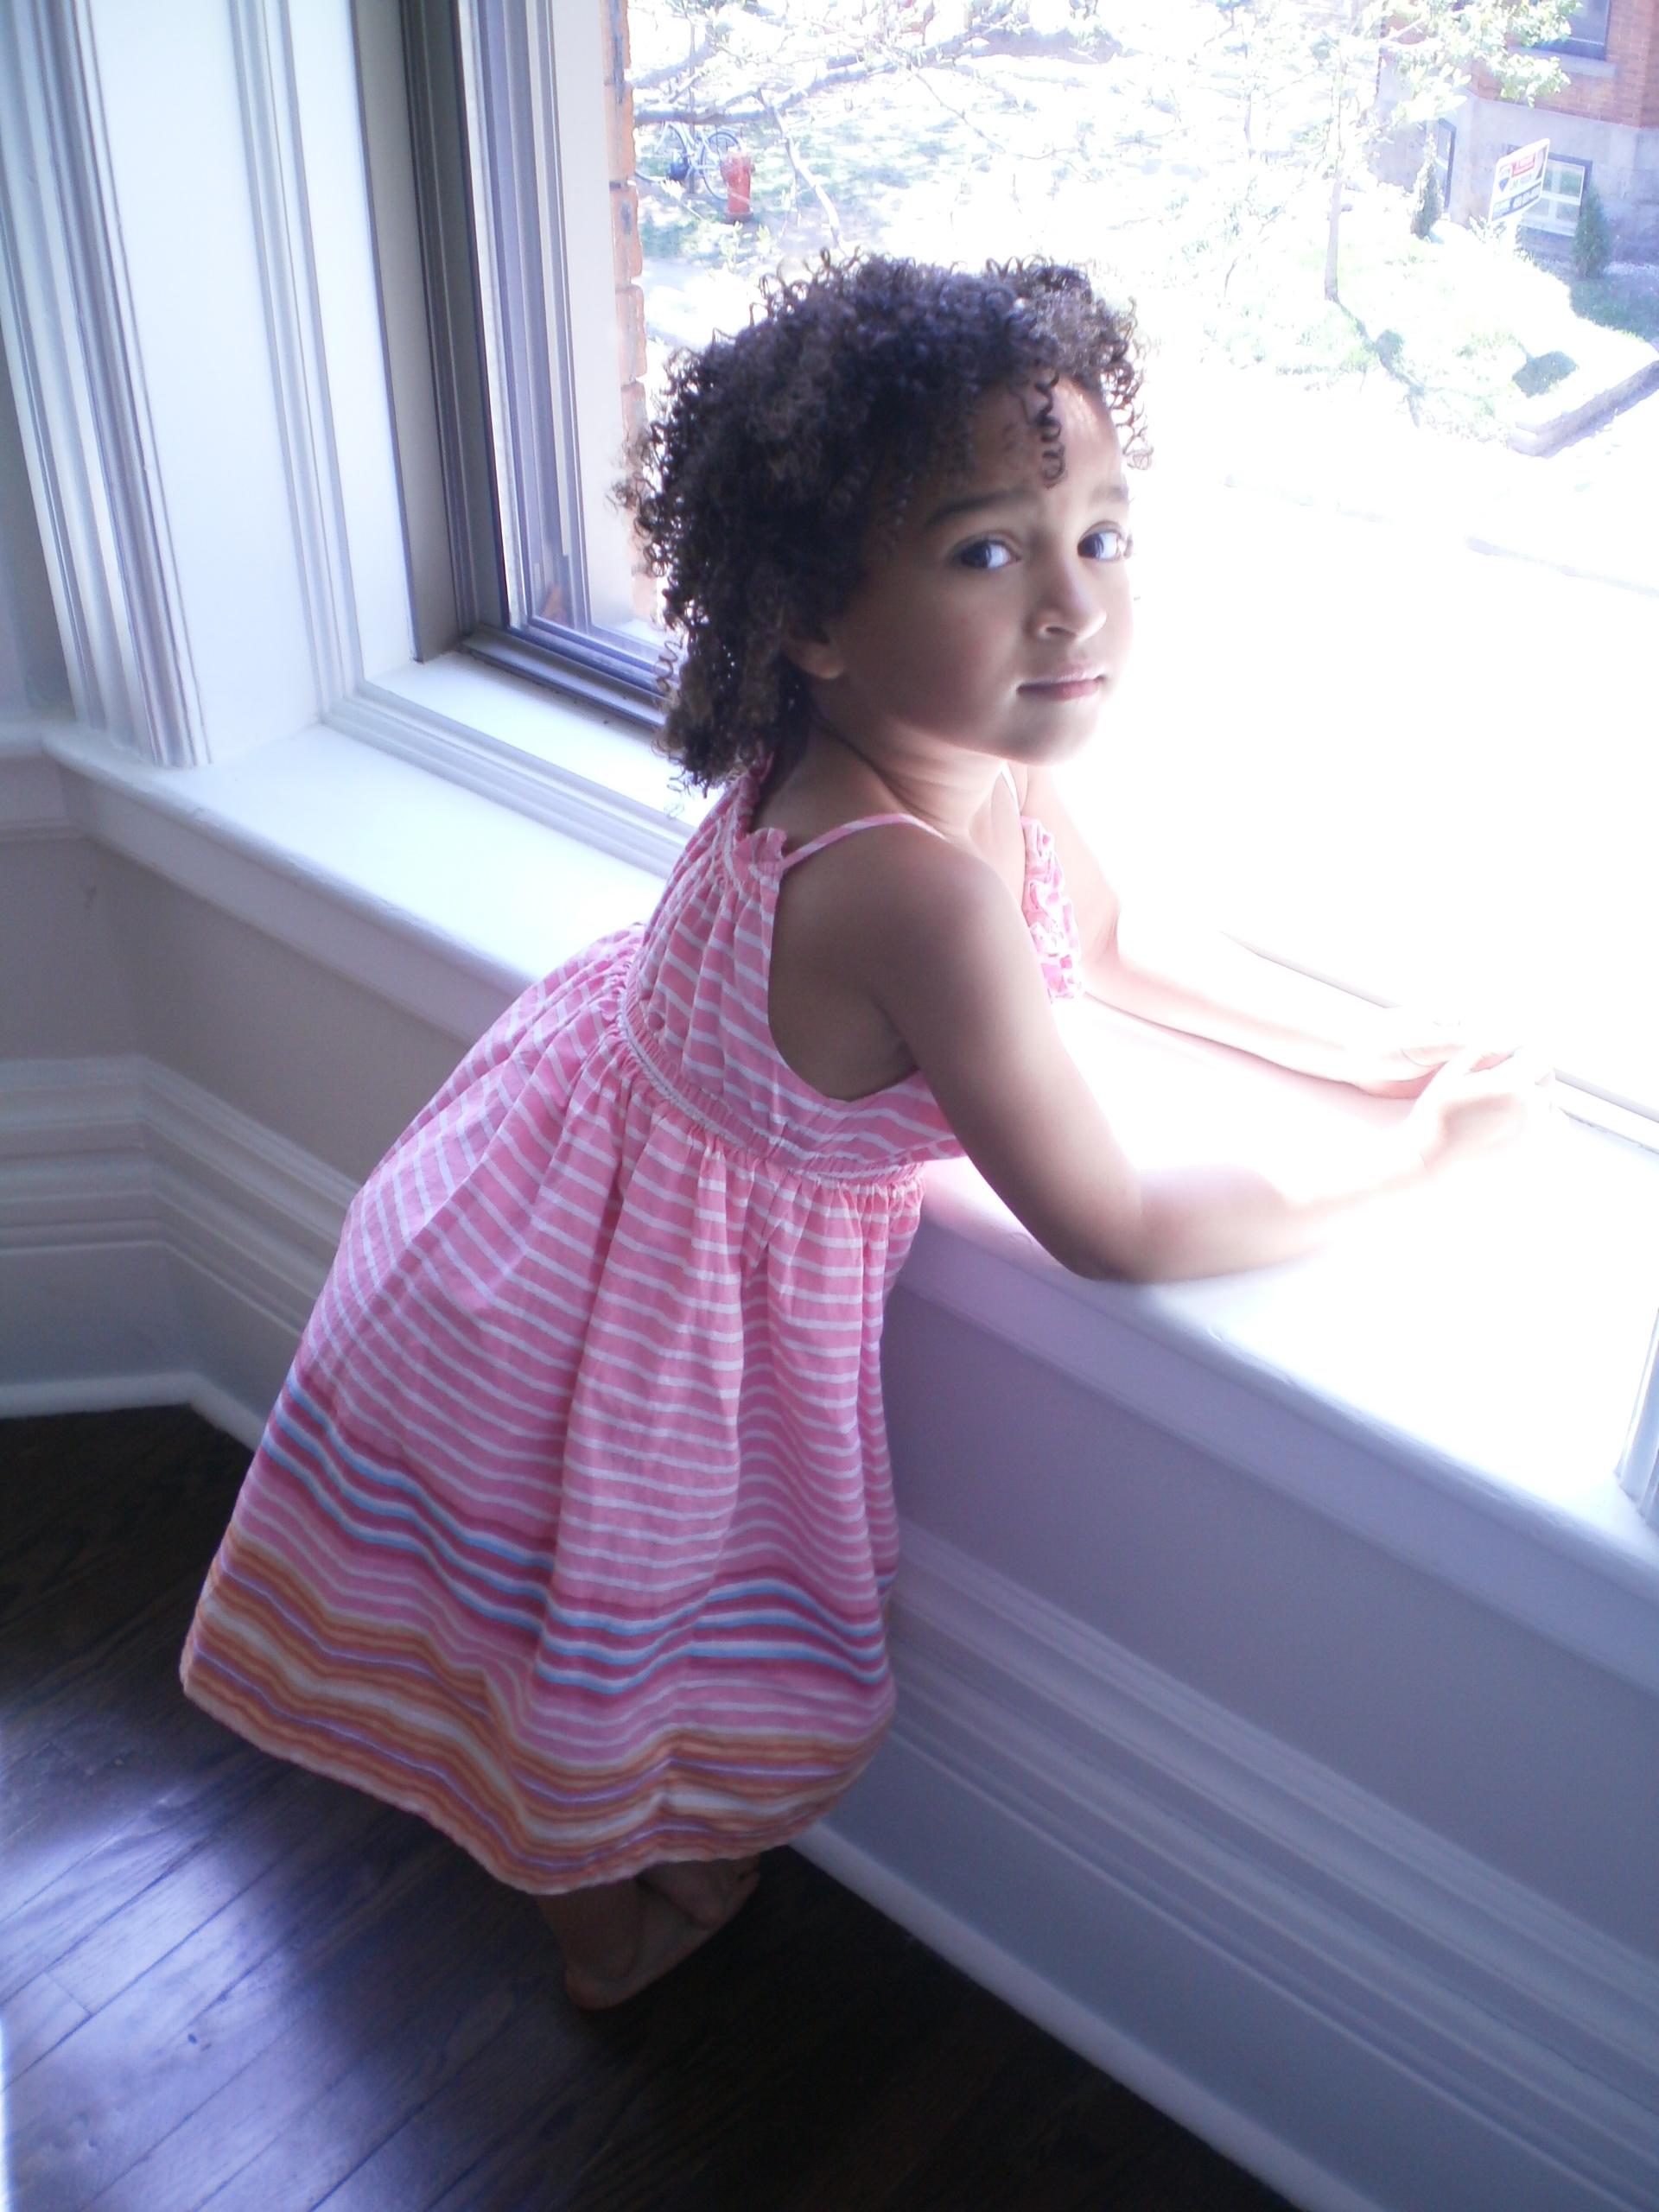 Urban Kid Closet – June 6th, 2013